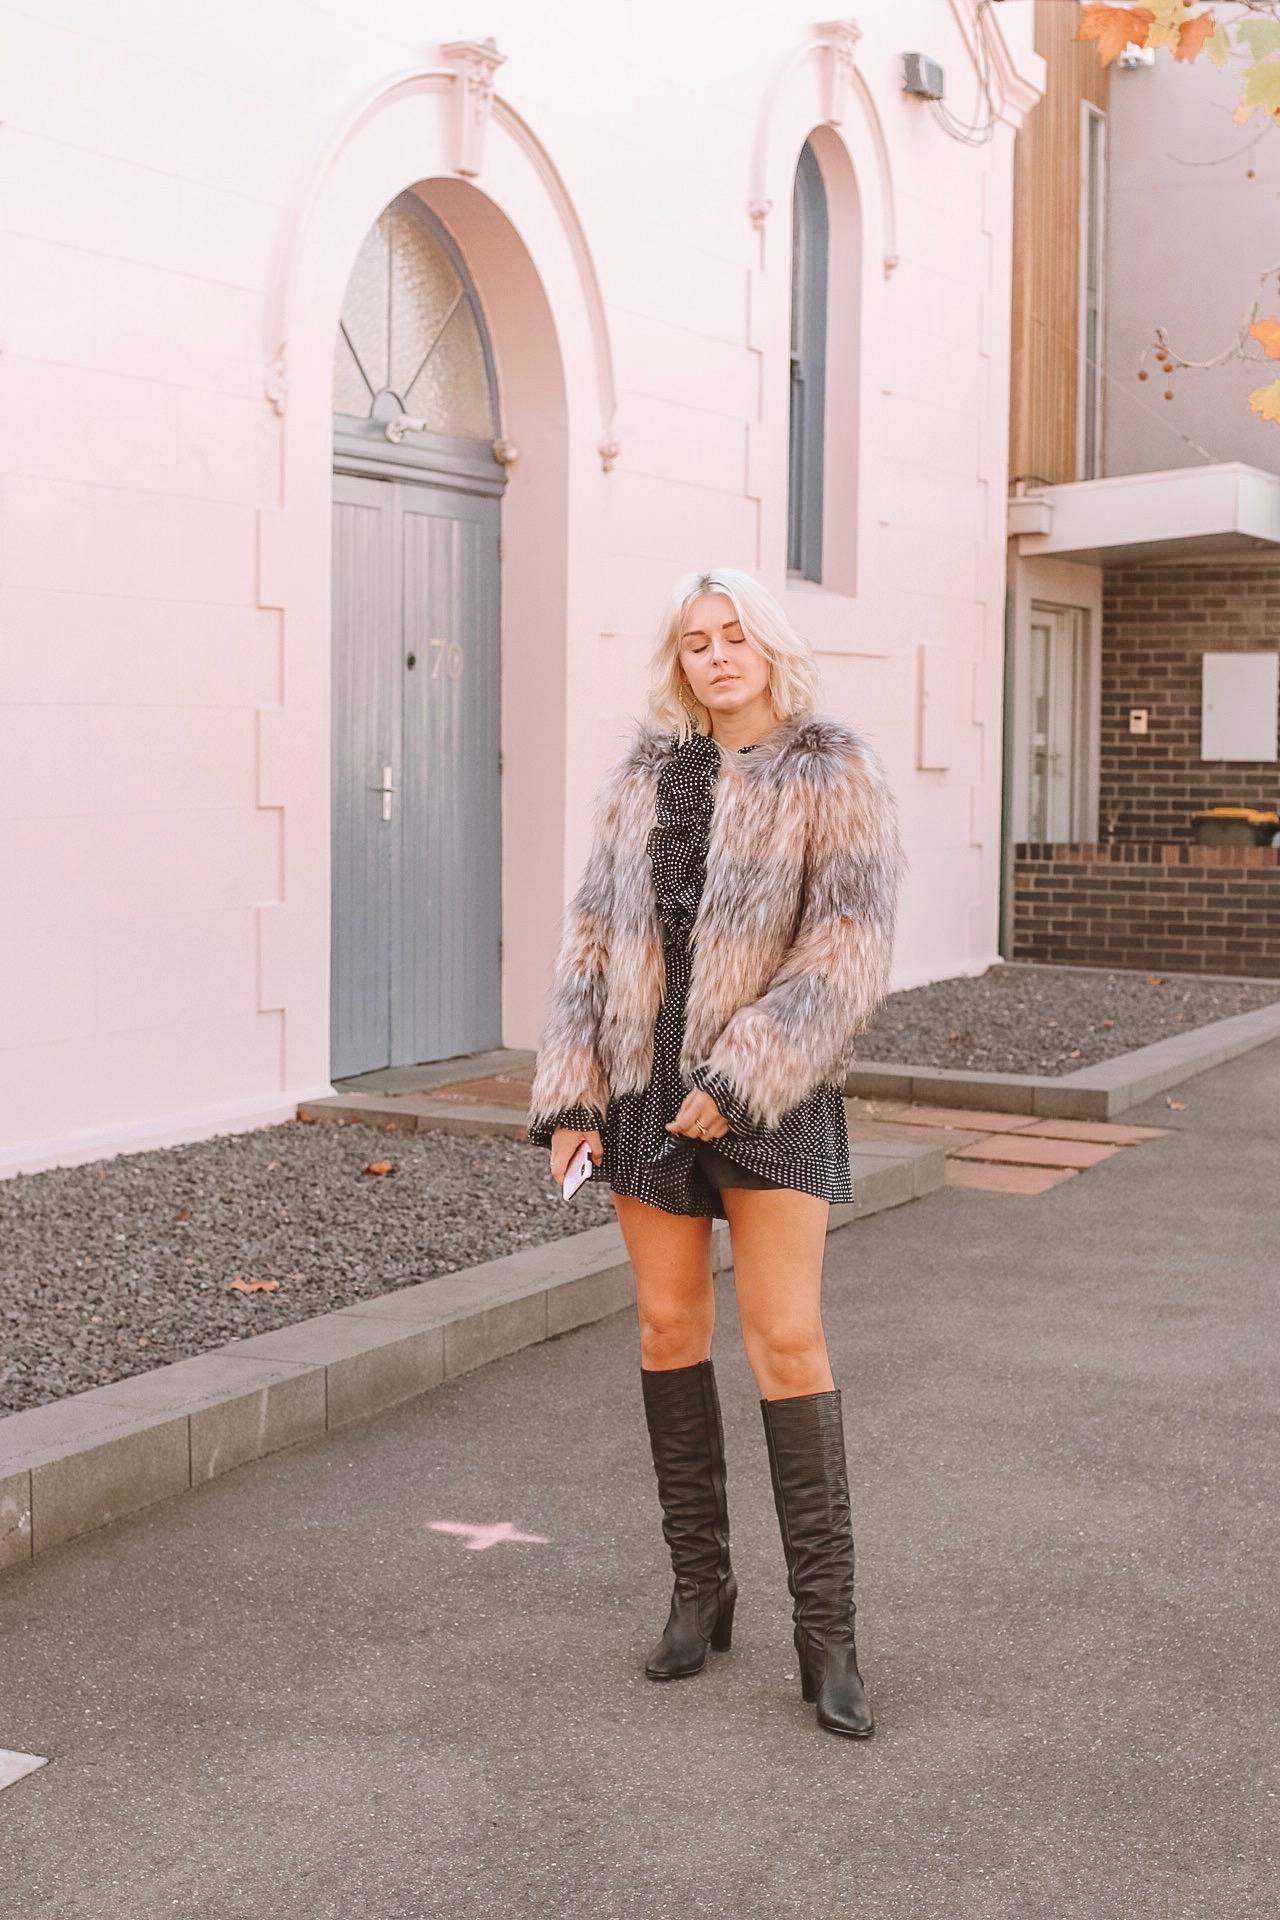 Visit www.felixandscott.com for more fashion.